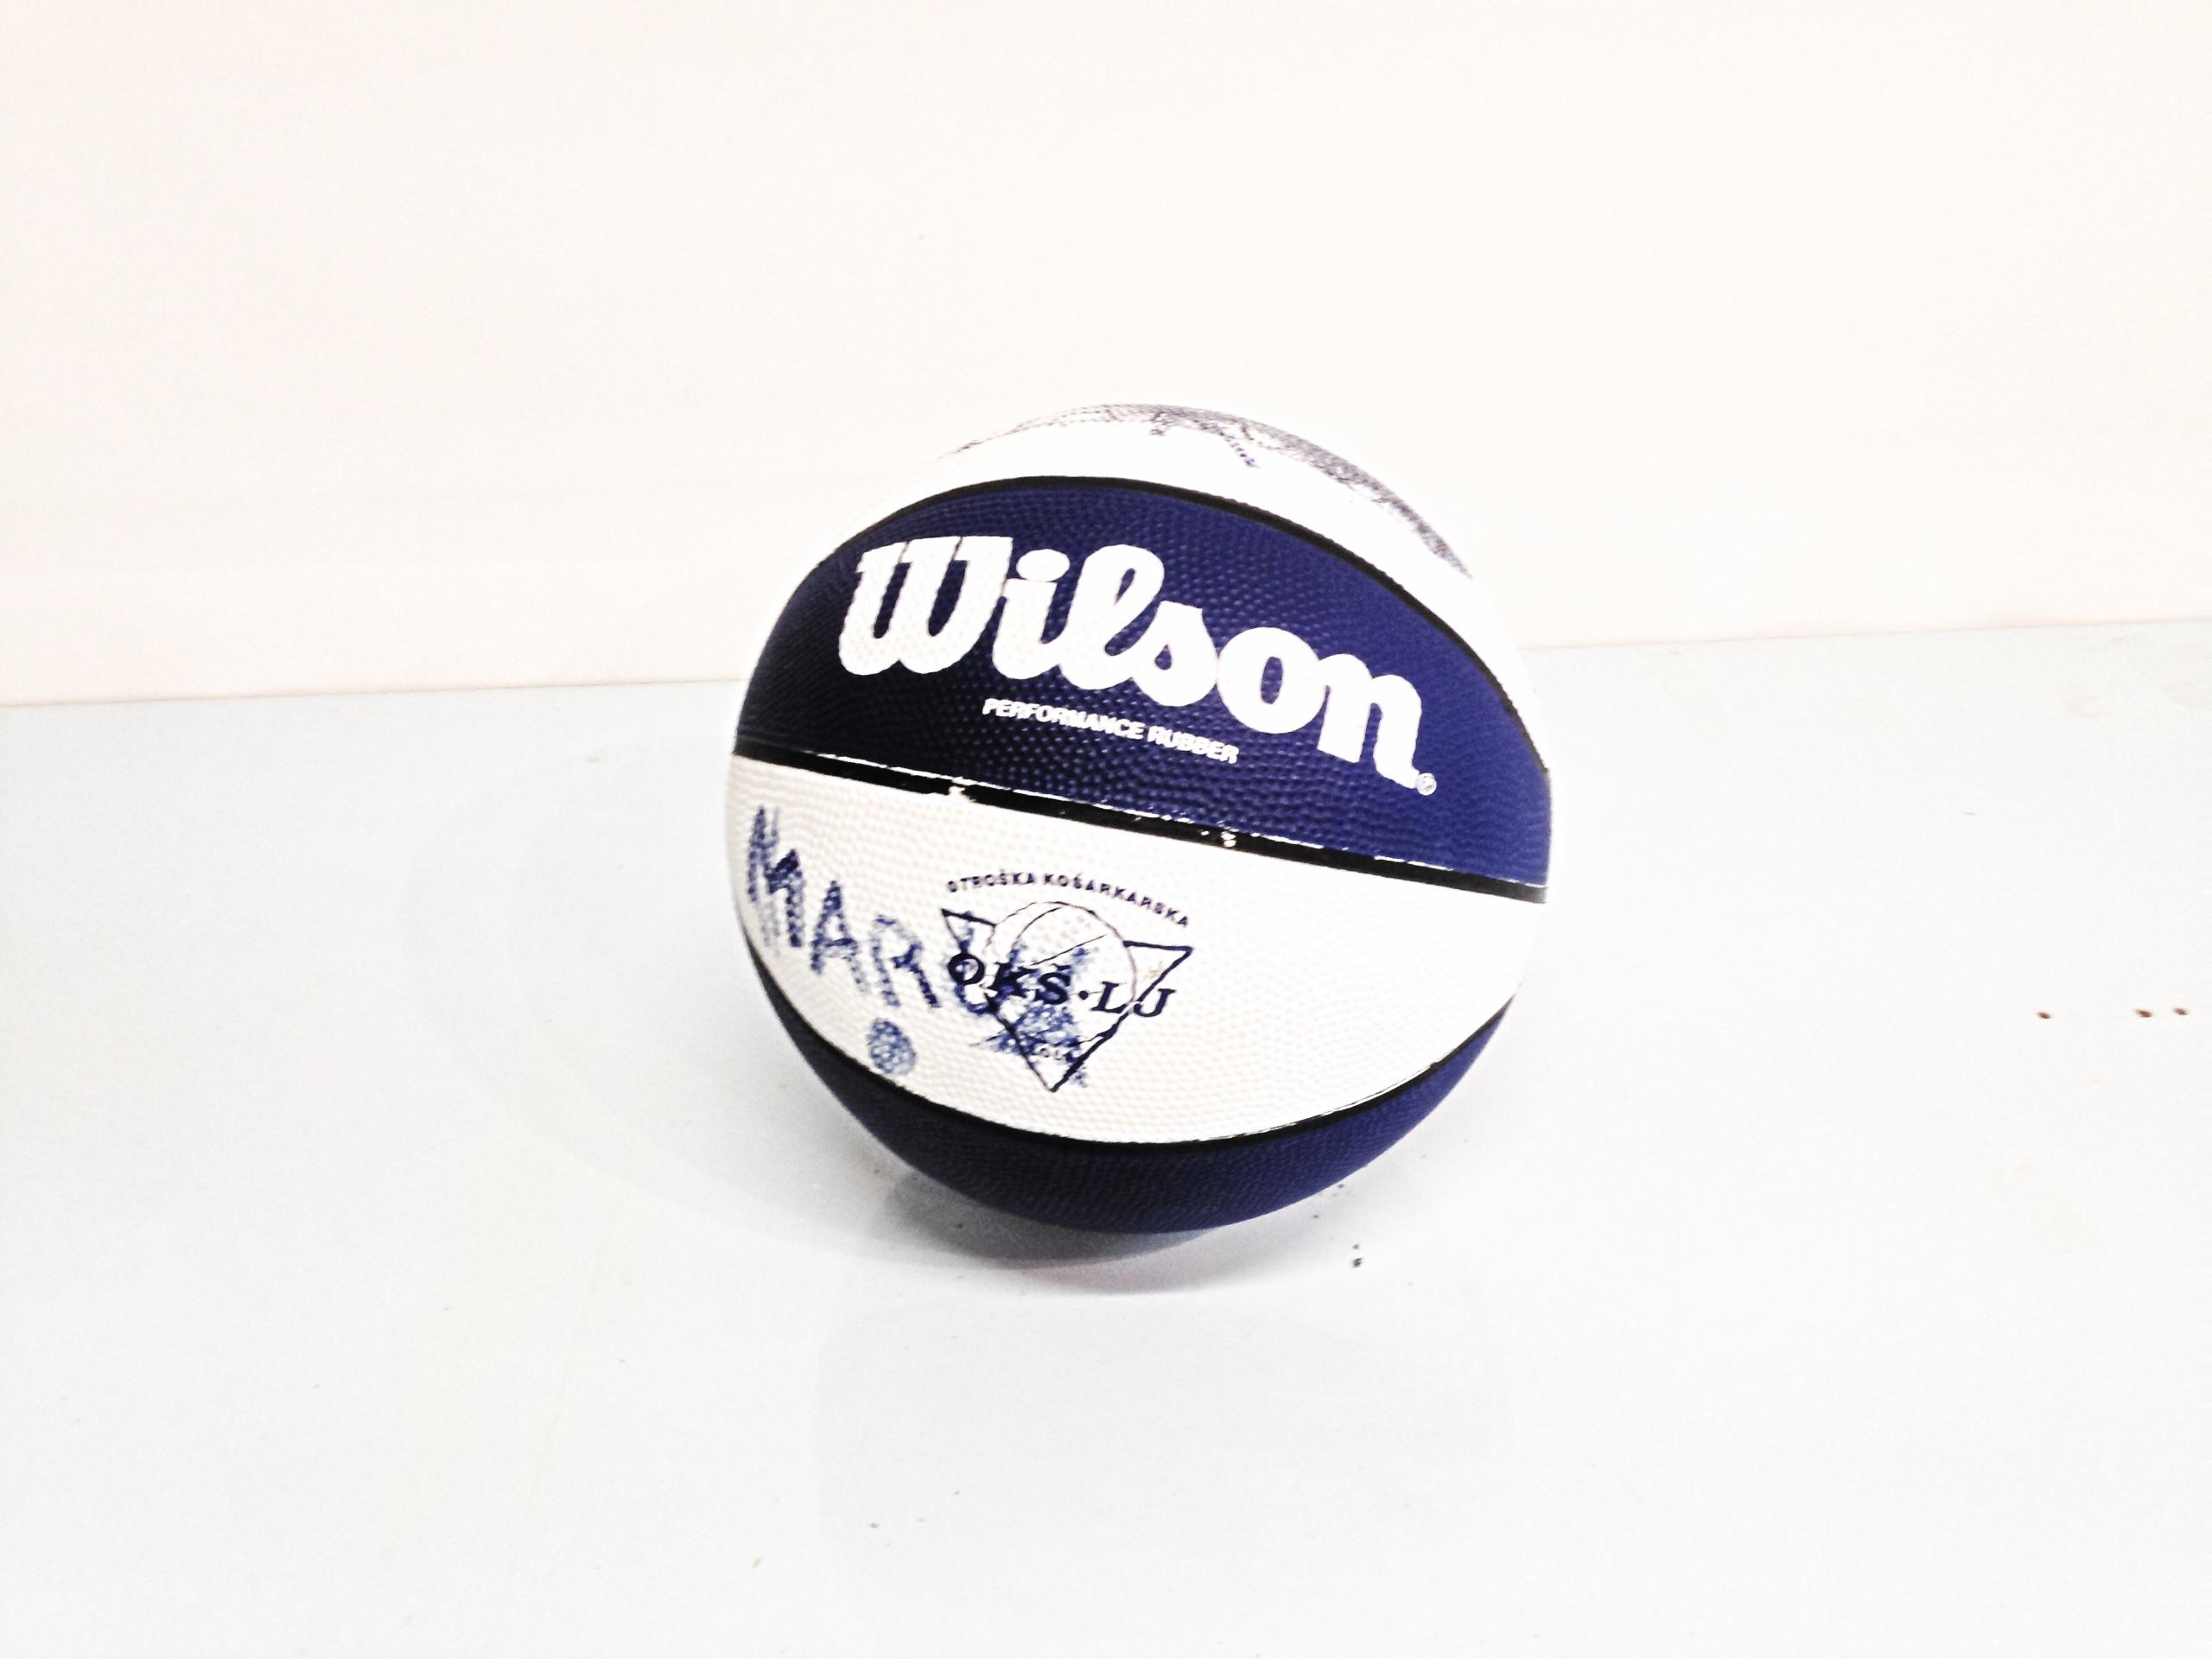 Žoga, košarkaška